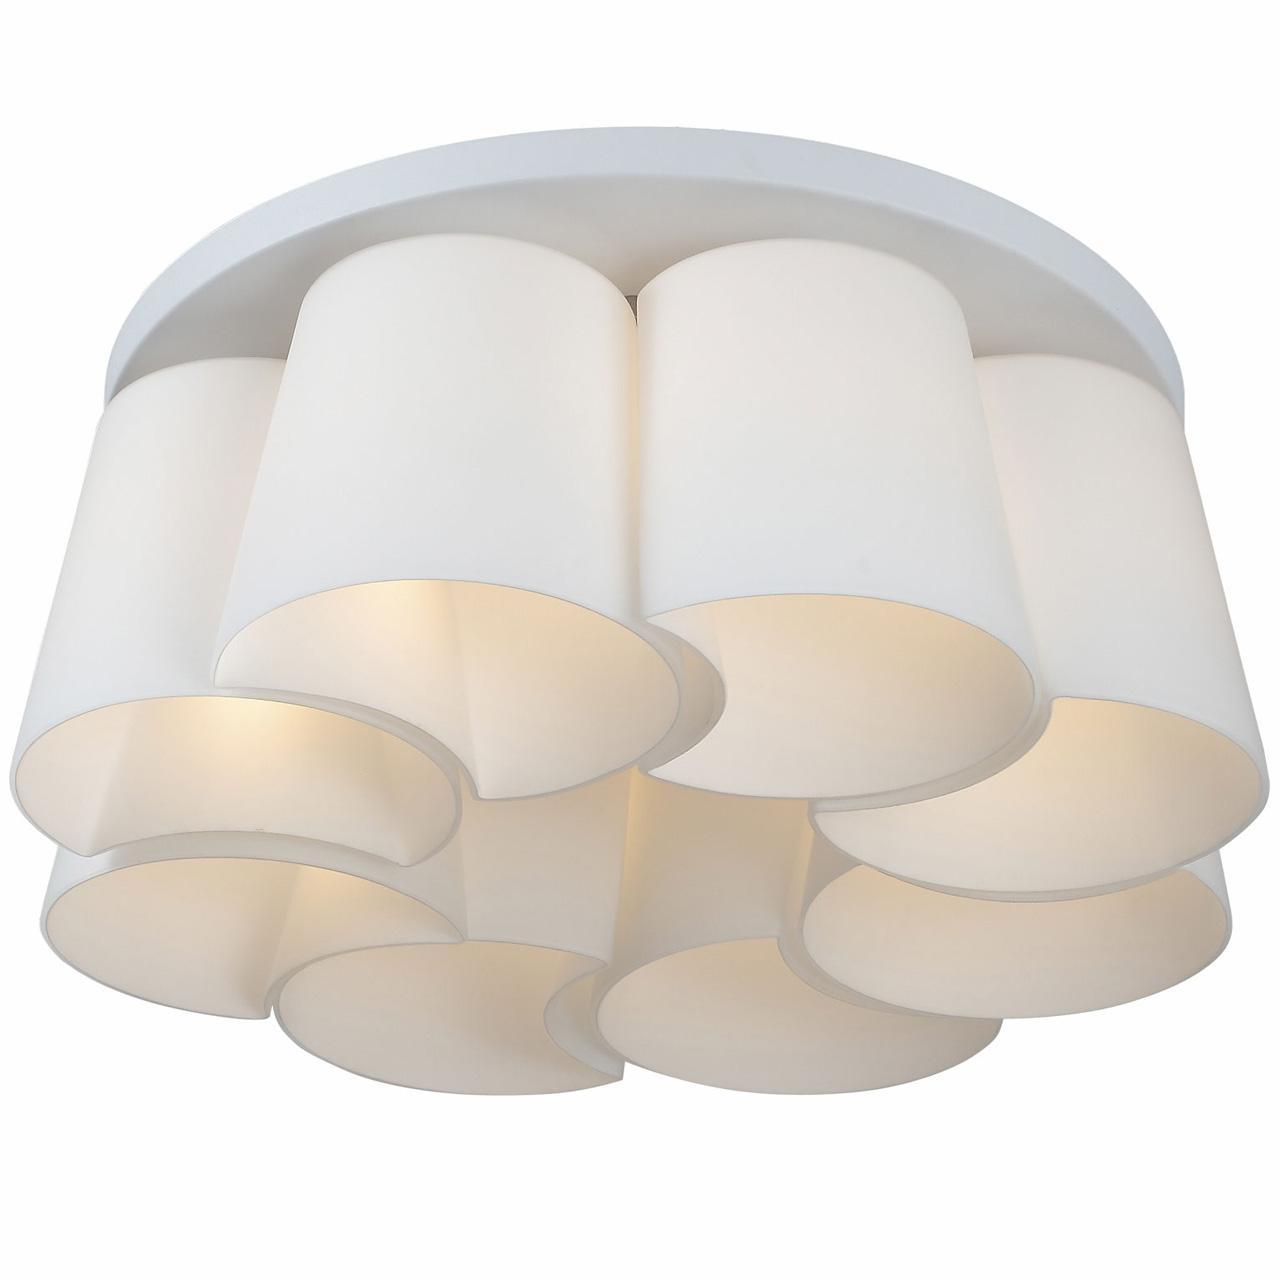 Люстра ST Luce Chiello SL543.502.08 потолочная st luce sl536 091 01